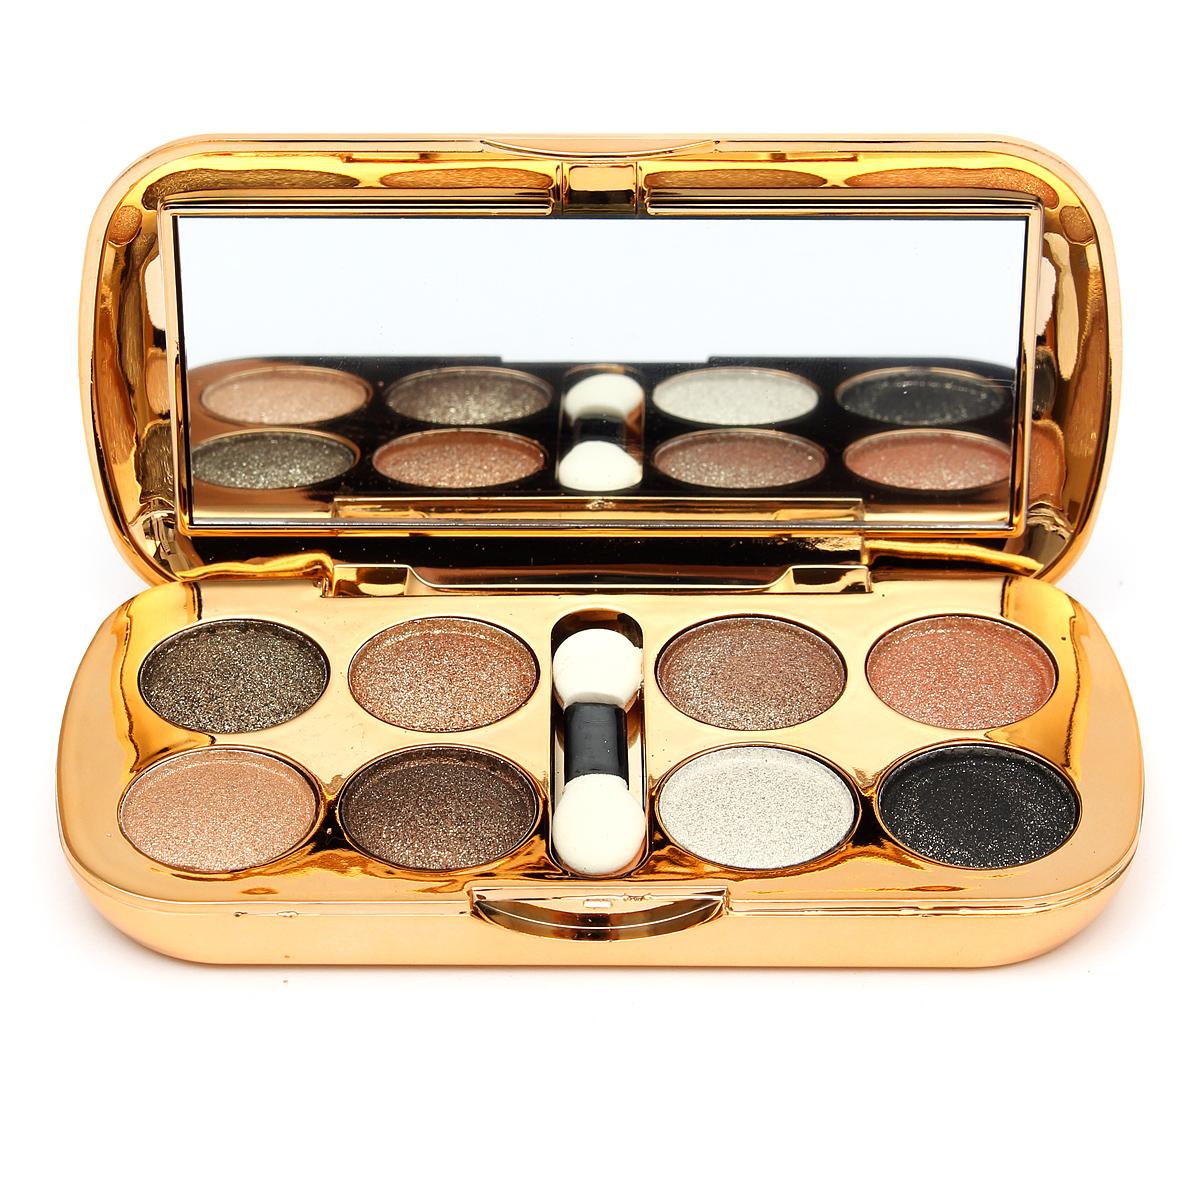 8 Colors Glitter Eyeshadow Powder Makeup Palette Set ...